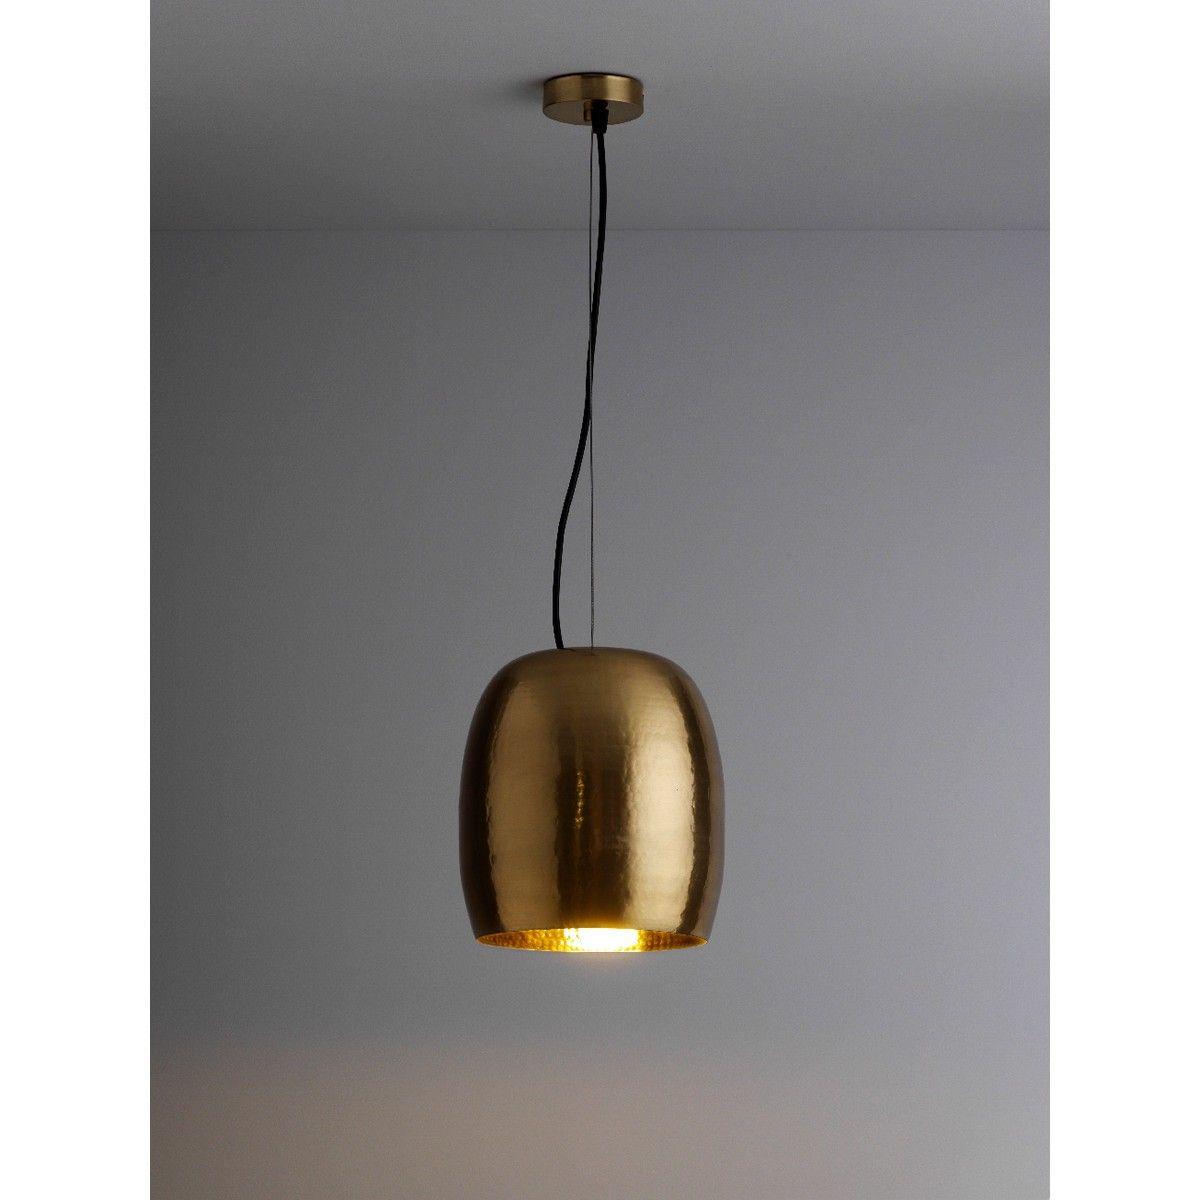 MARTEAU Gold mini metal ceiling light   Buy now at Habitat UK ...